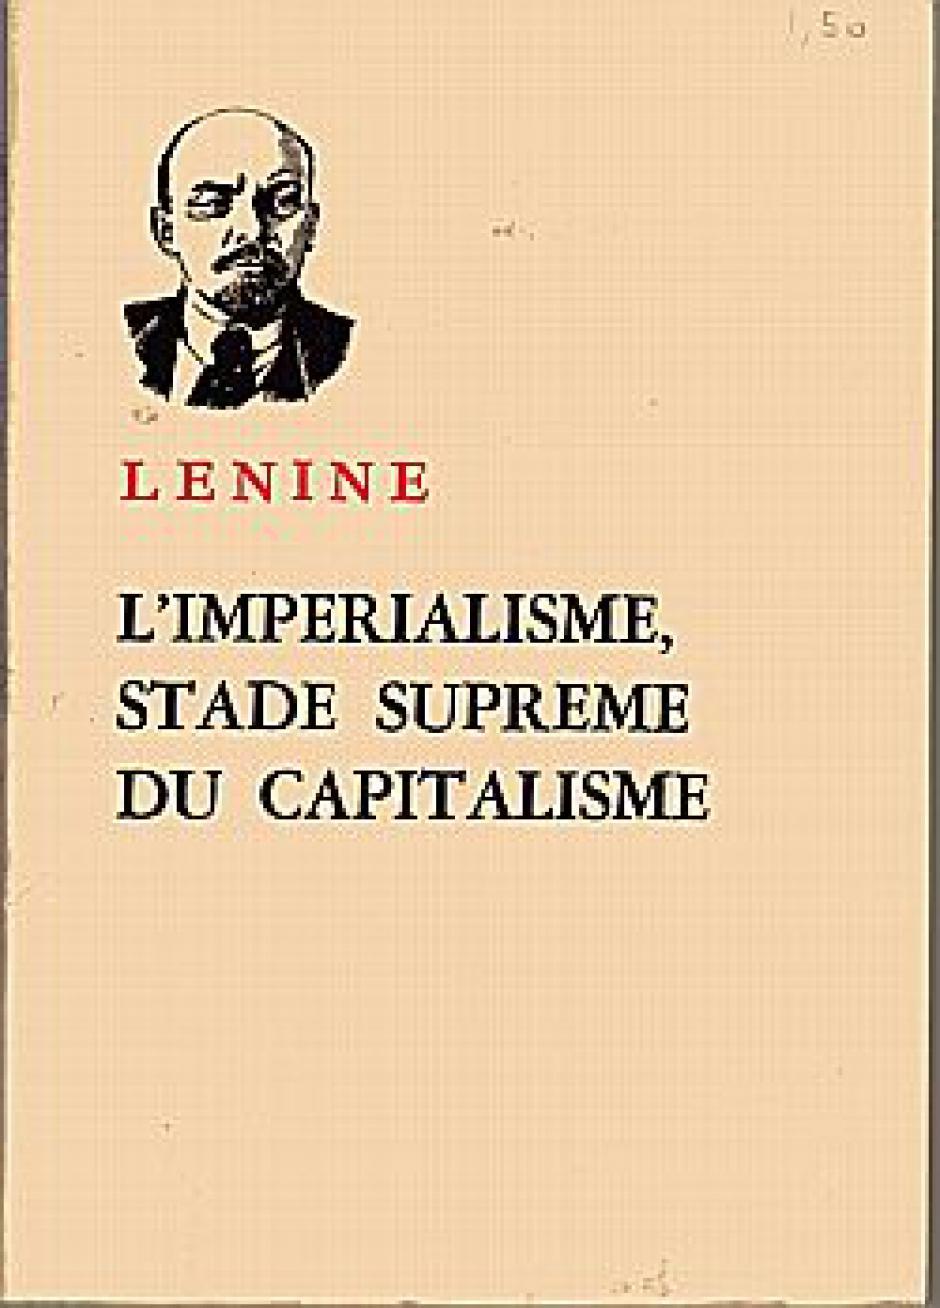 L'impérialisme capitaliste, Flaron Gulli, Aurélien Aramini